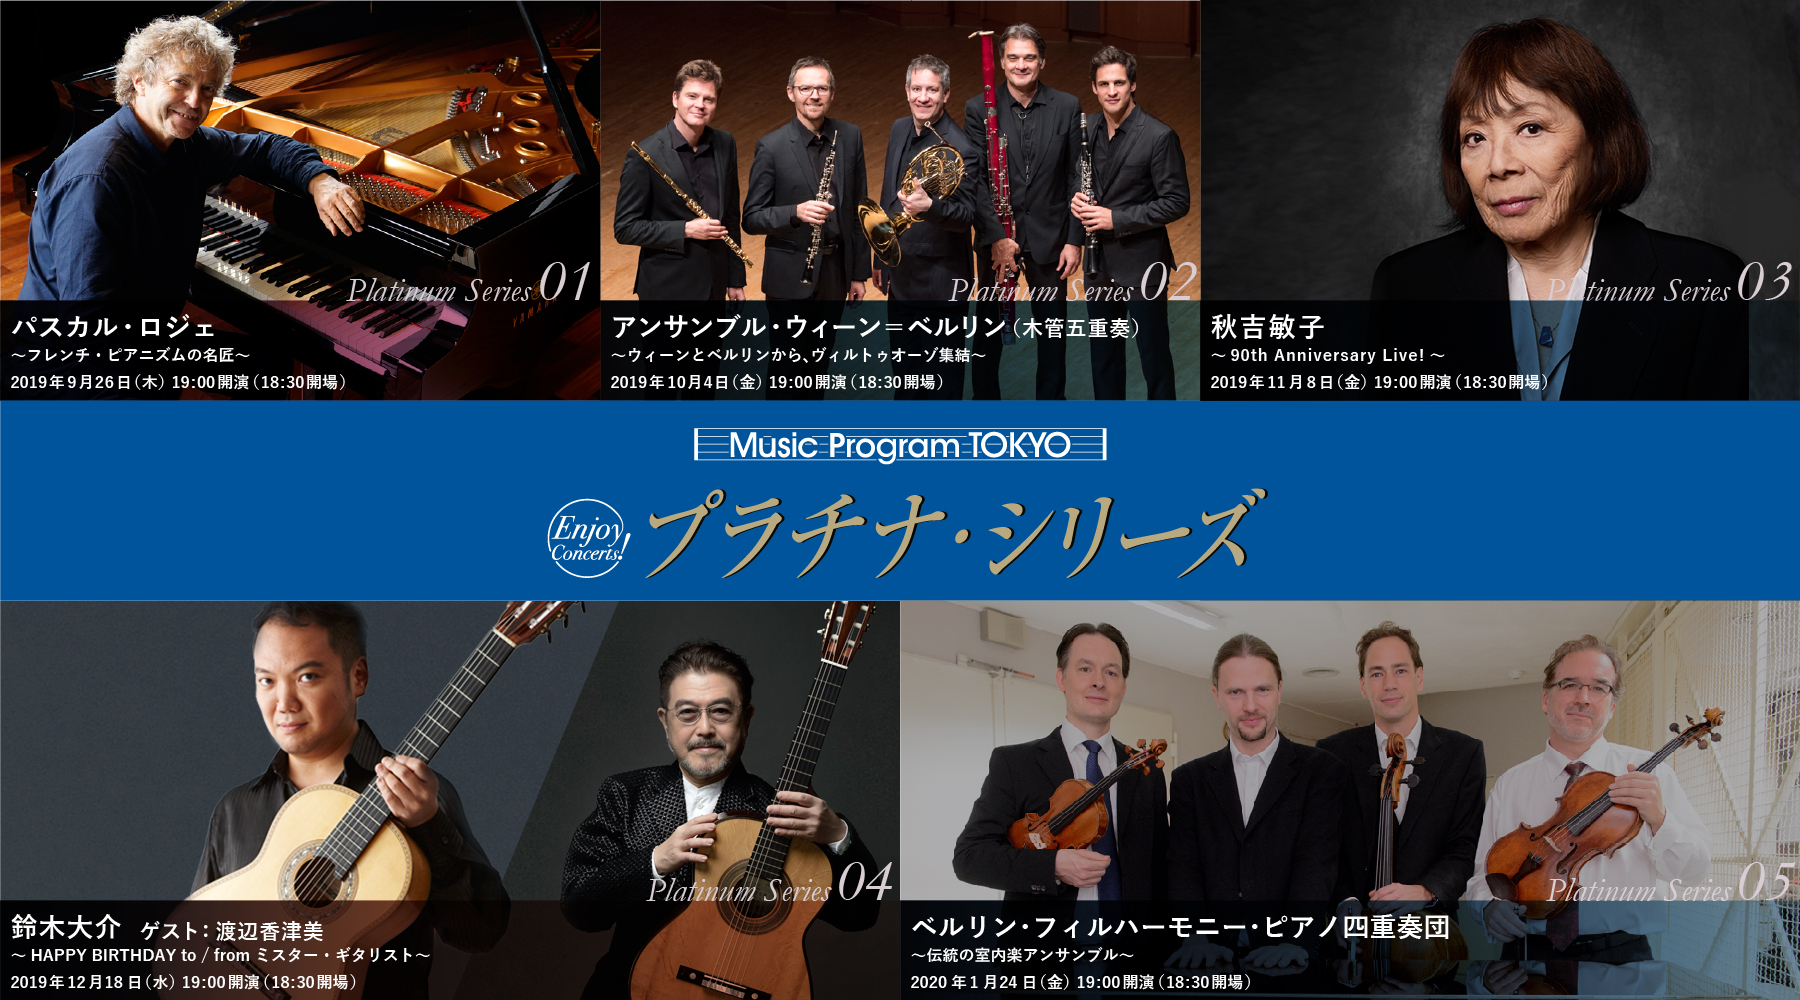 Music Program TOKYO プラチナ・シリーズ